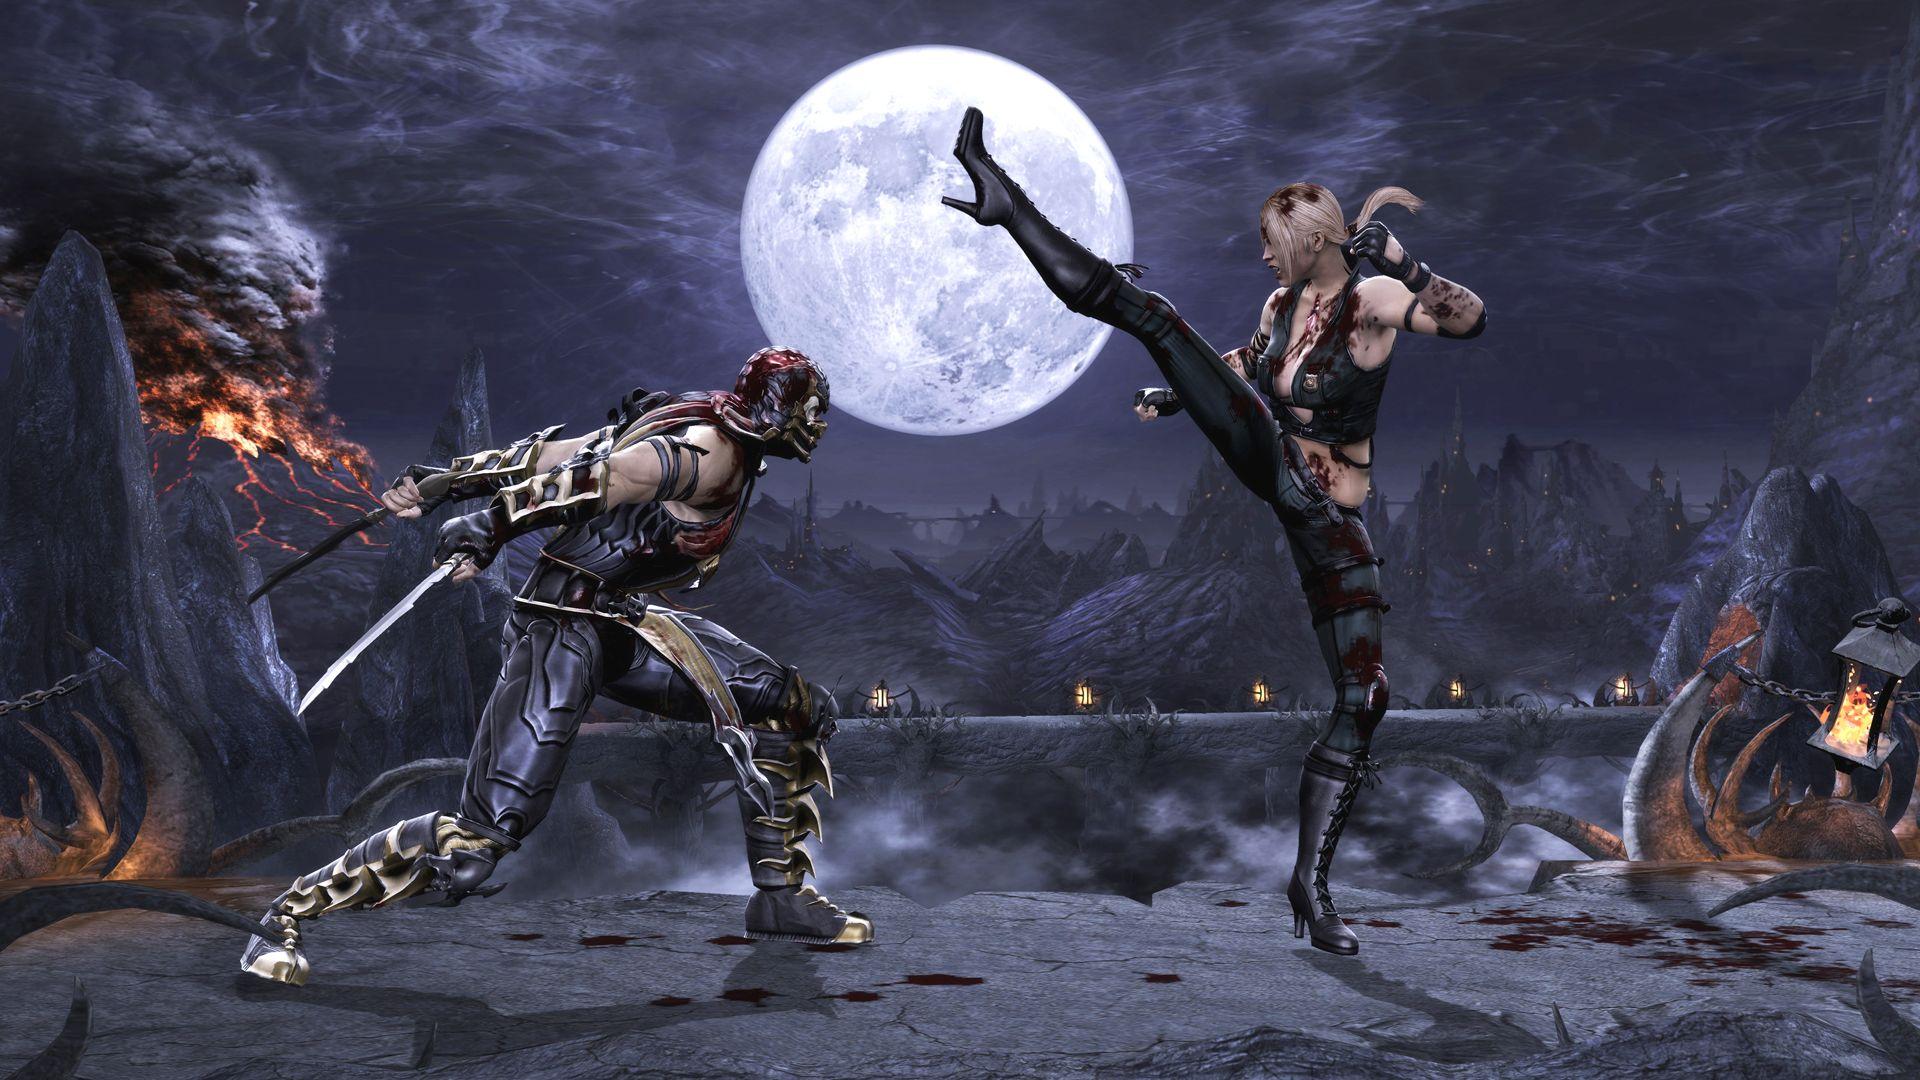 Mortal Kombat 2011 Sonya Blade Vs Scorpion Pit Jpg Obrazek Jpeg 1920 1080 Pikseli Skala 89 Mortal Kombat 9 Mortal Kombat Mortal Kombat Komplete Edition